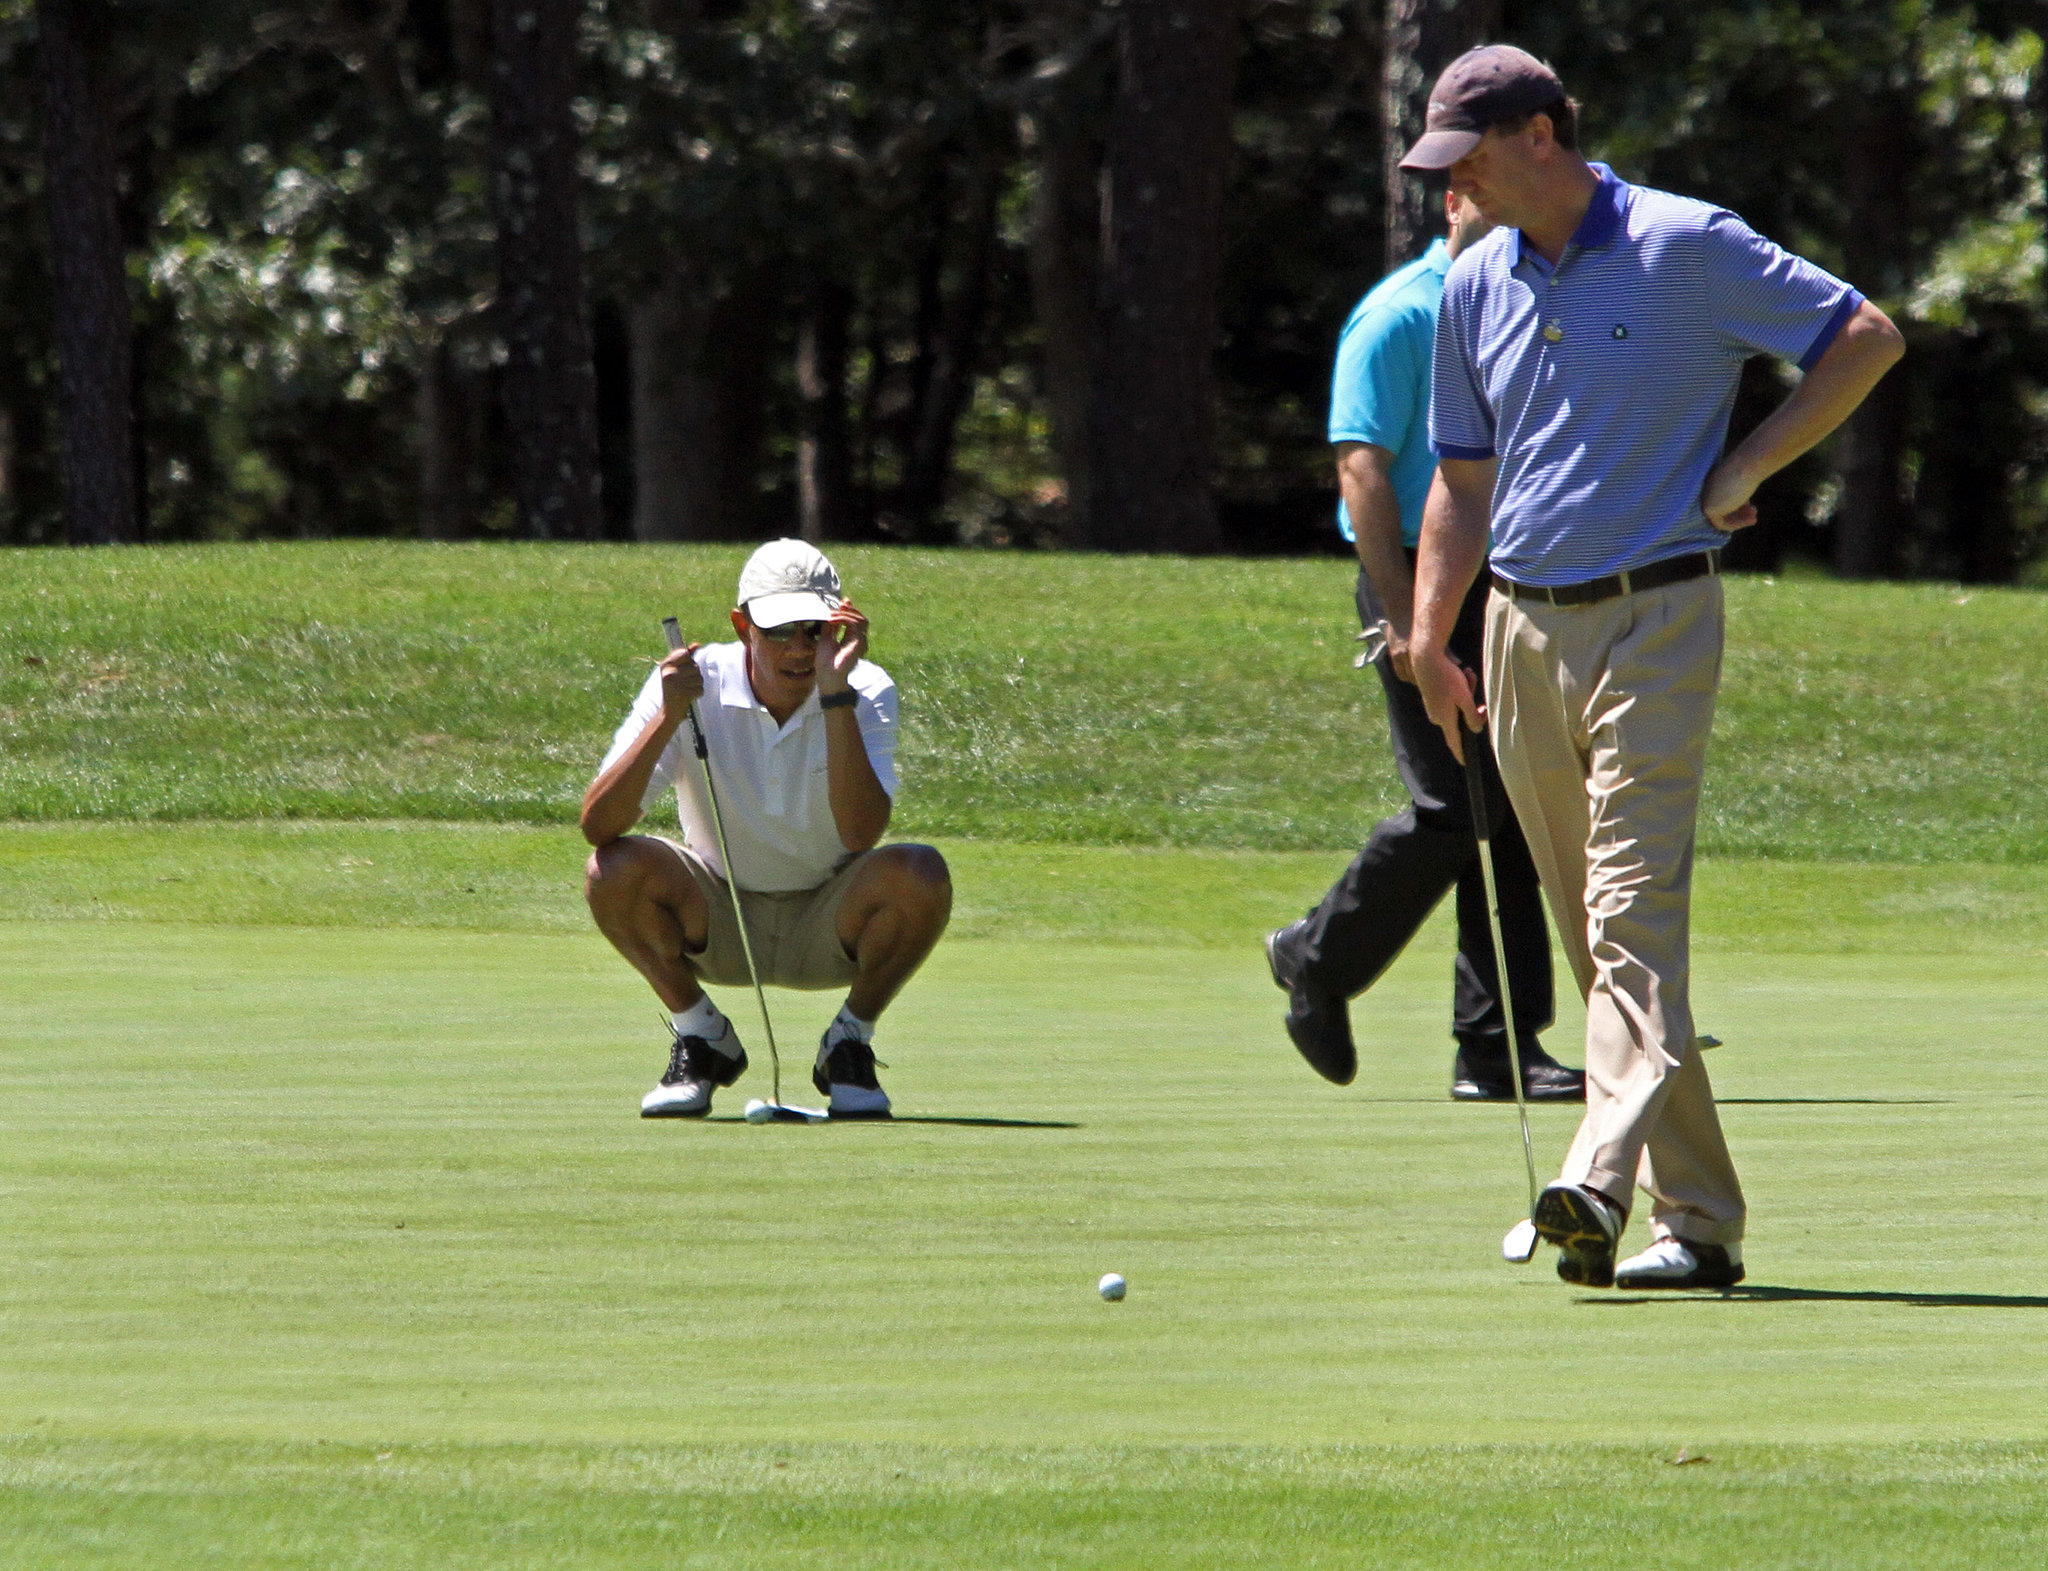 On Sunday, President Obama played some golf.